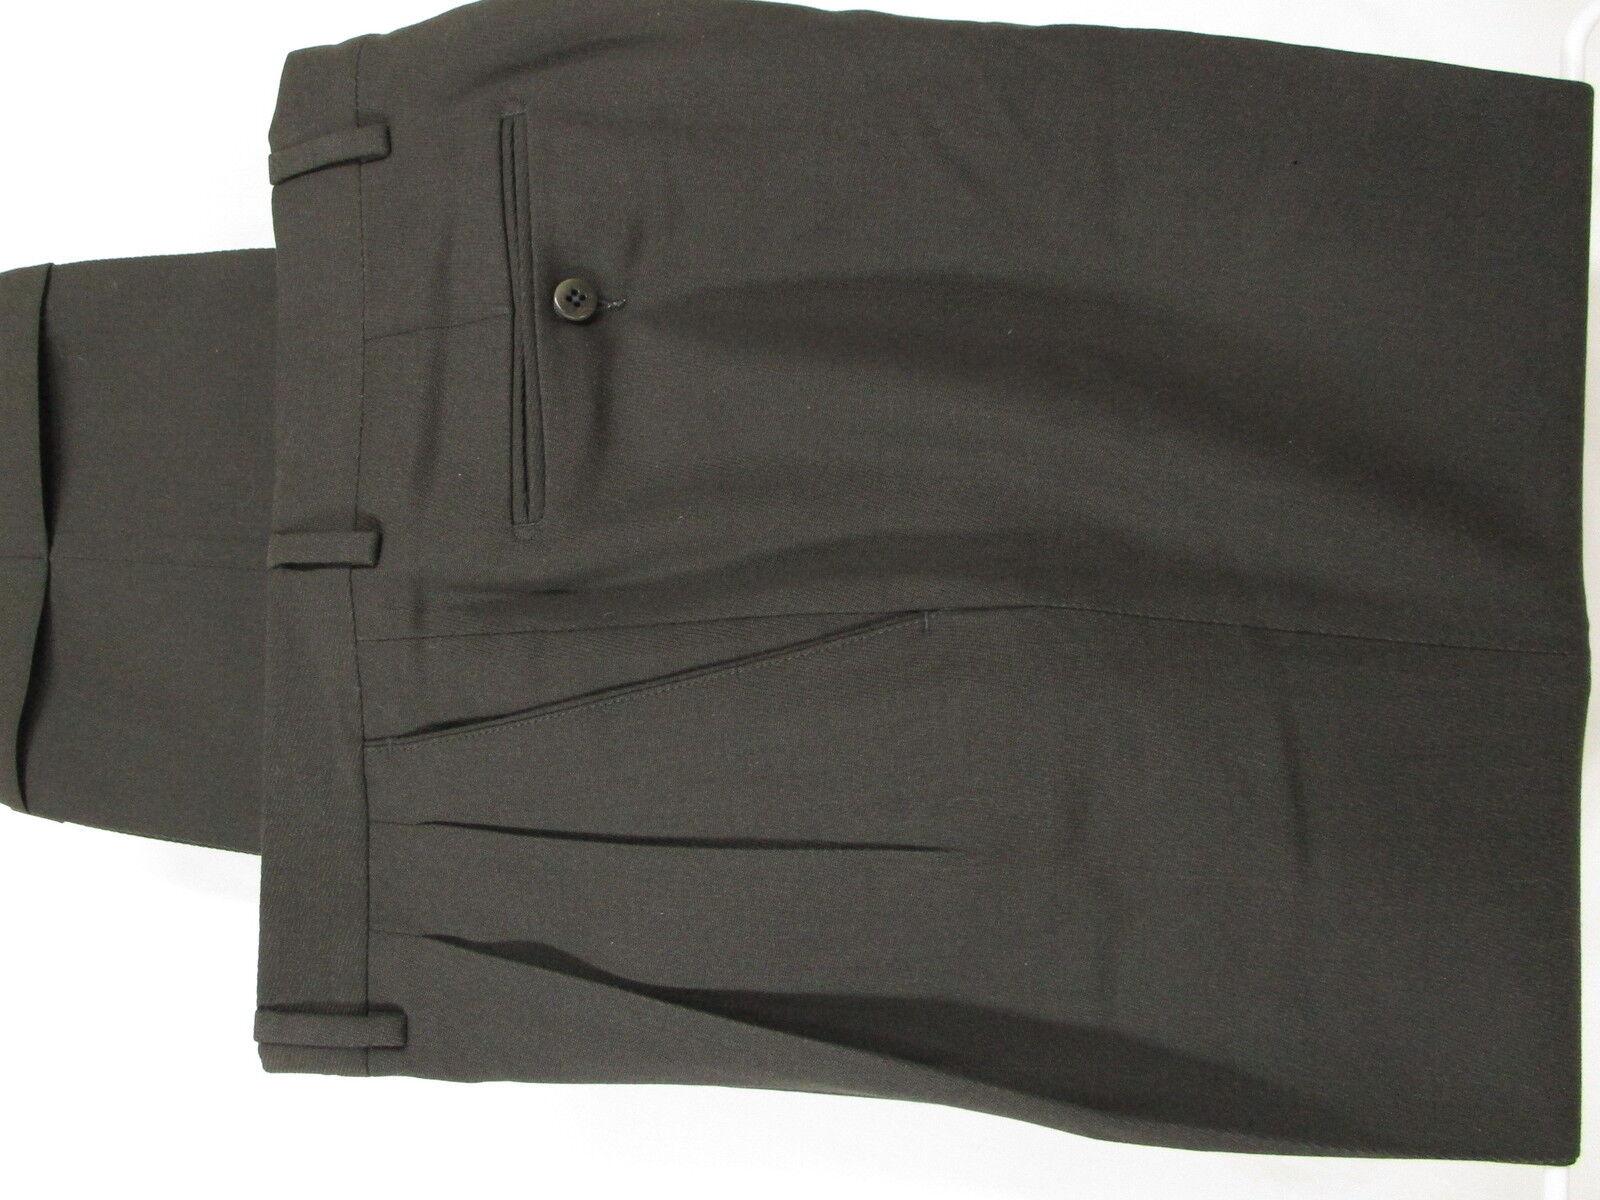 Ermenegildo Zegna Mens Charcoal Pleated Wool Dress Pants 33x29.5  Made